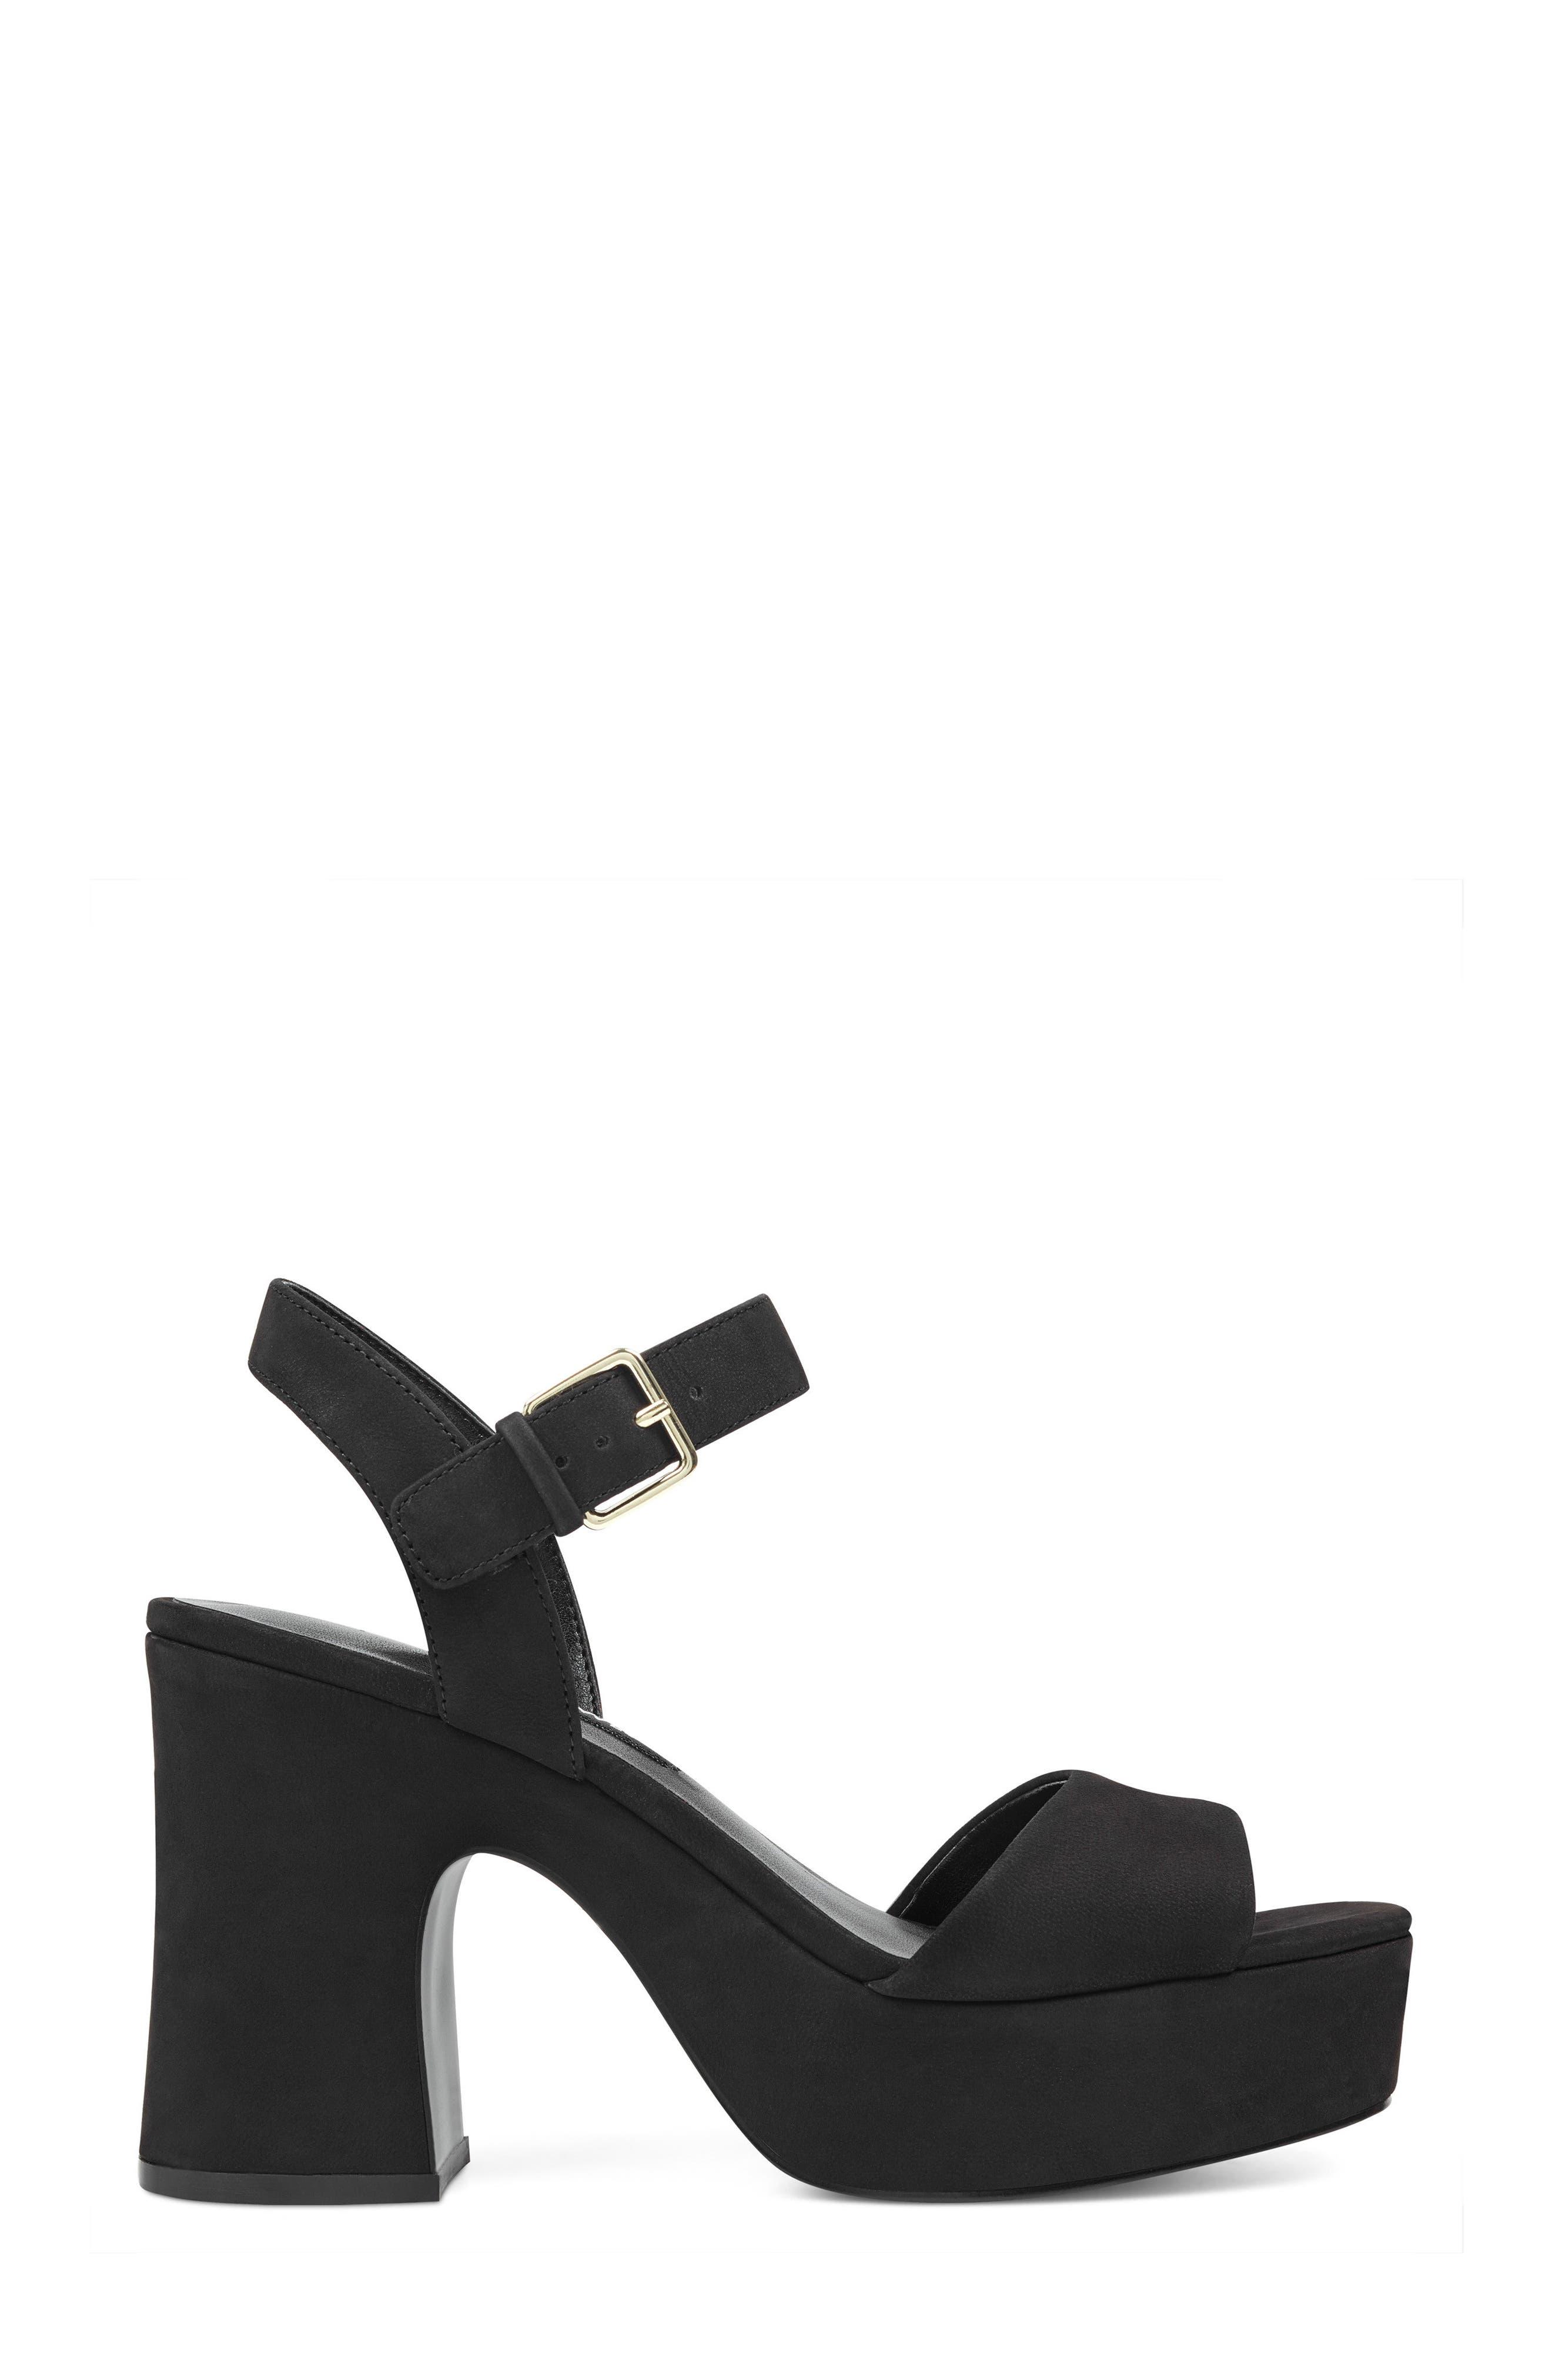 FallForU Platform Sandal,                             Alternate thumbnail 3, color,                             Black Leather